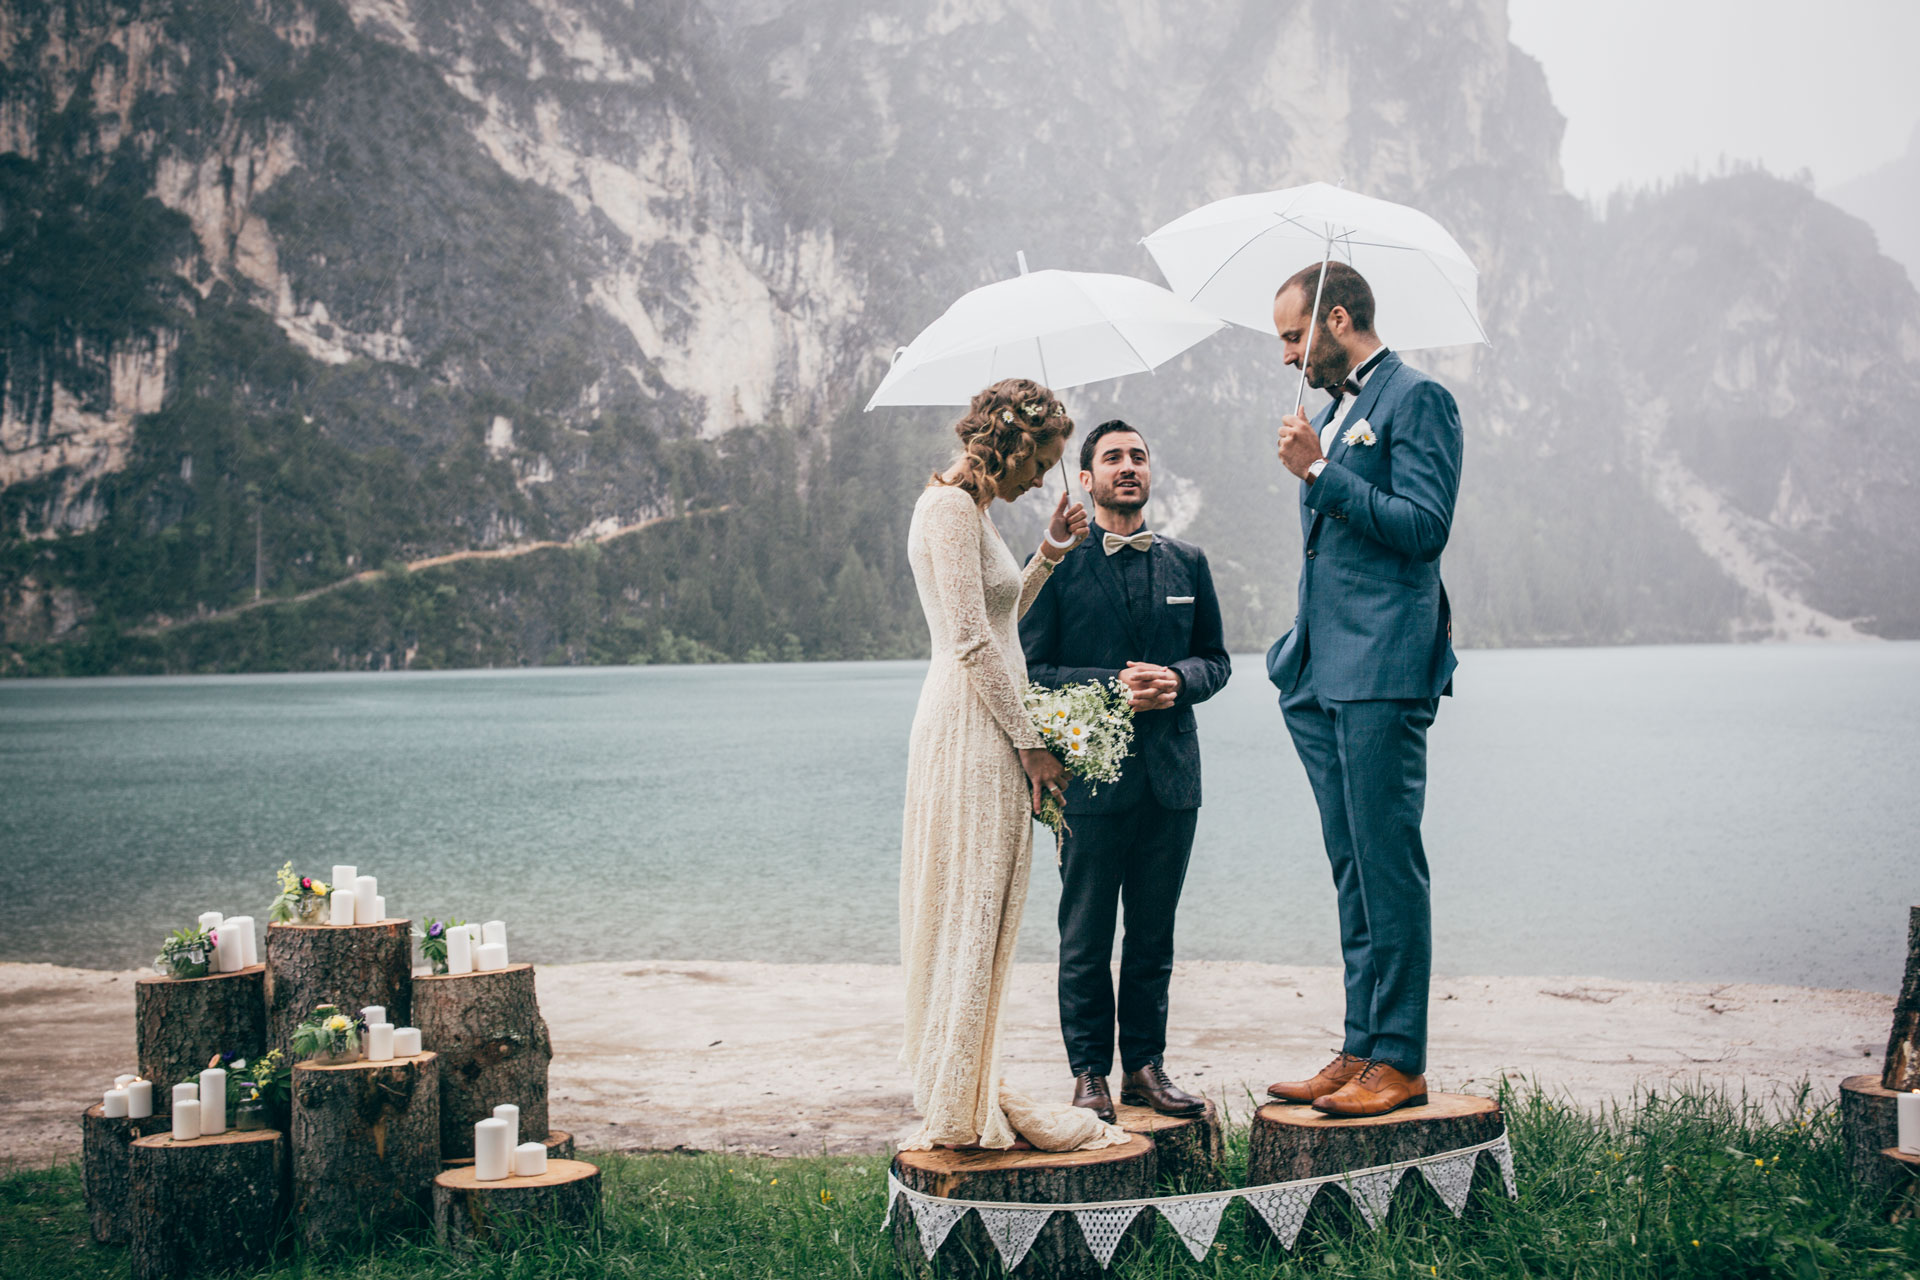 Destination wedding photographer – Elopement on lake Braies Dolomites Professional wedding photographer - Happy Birthday - photographer in Lake Garda - Verona - Valpolicella